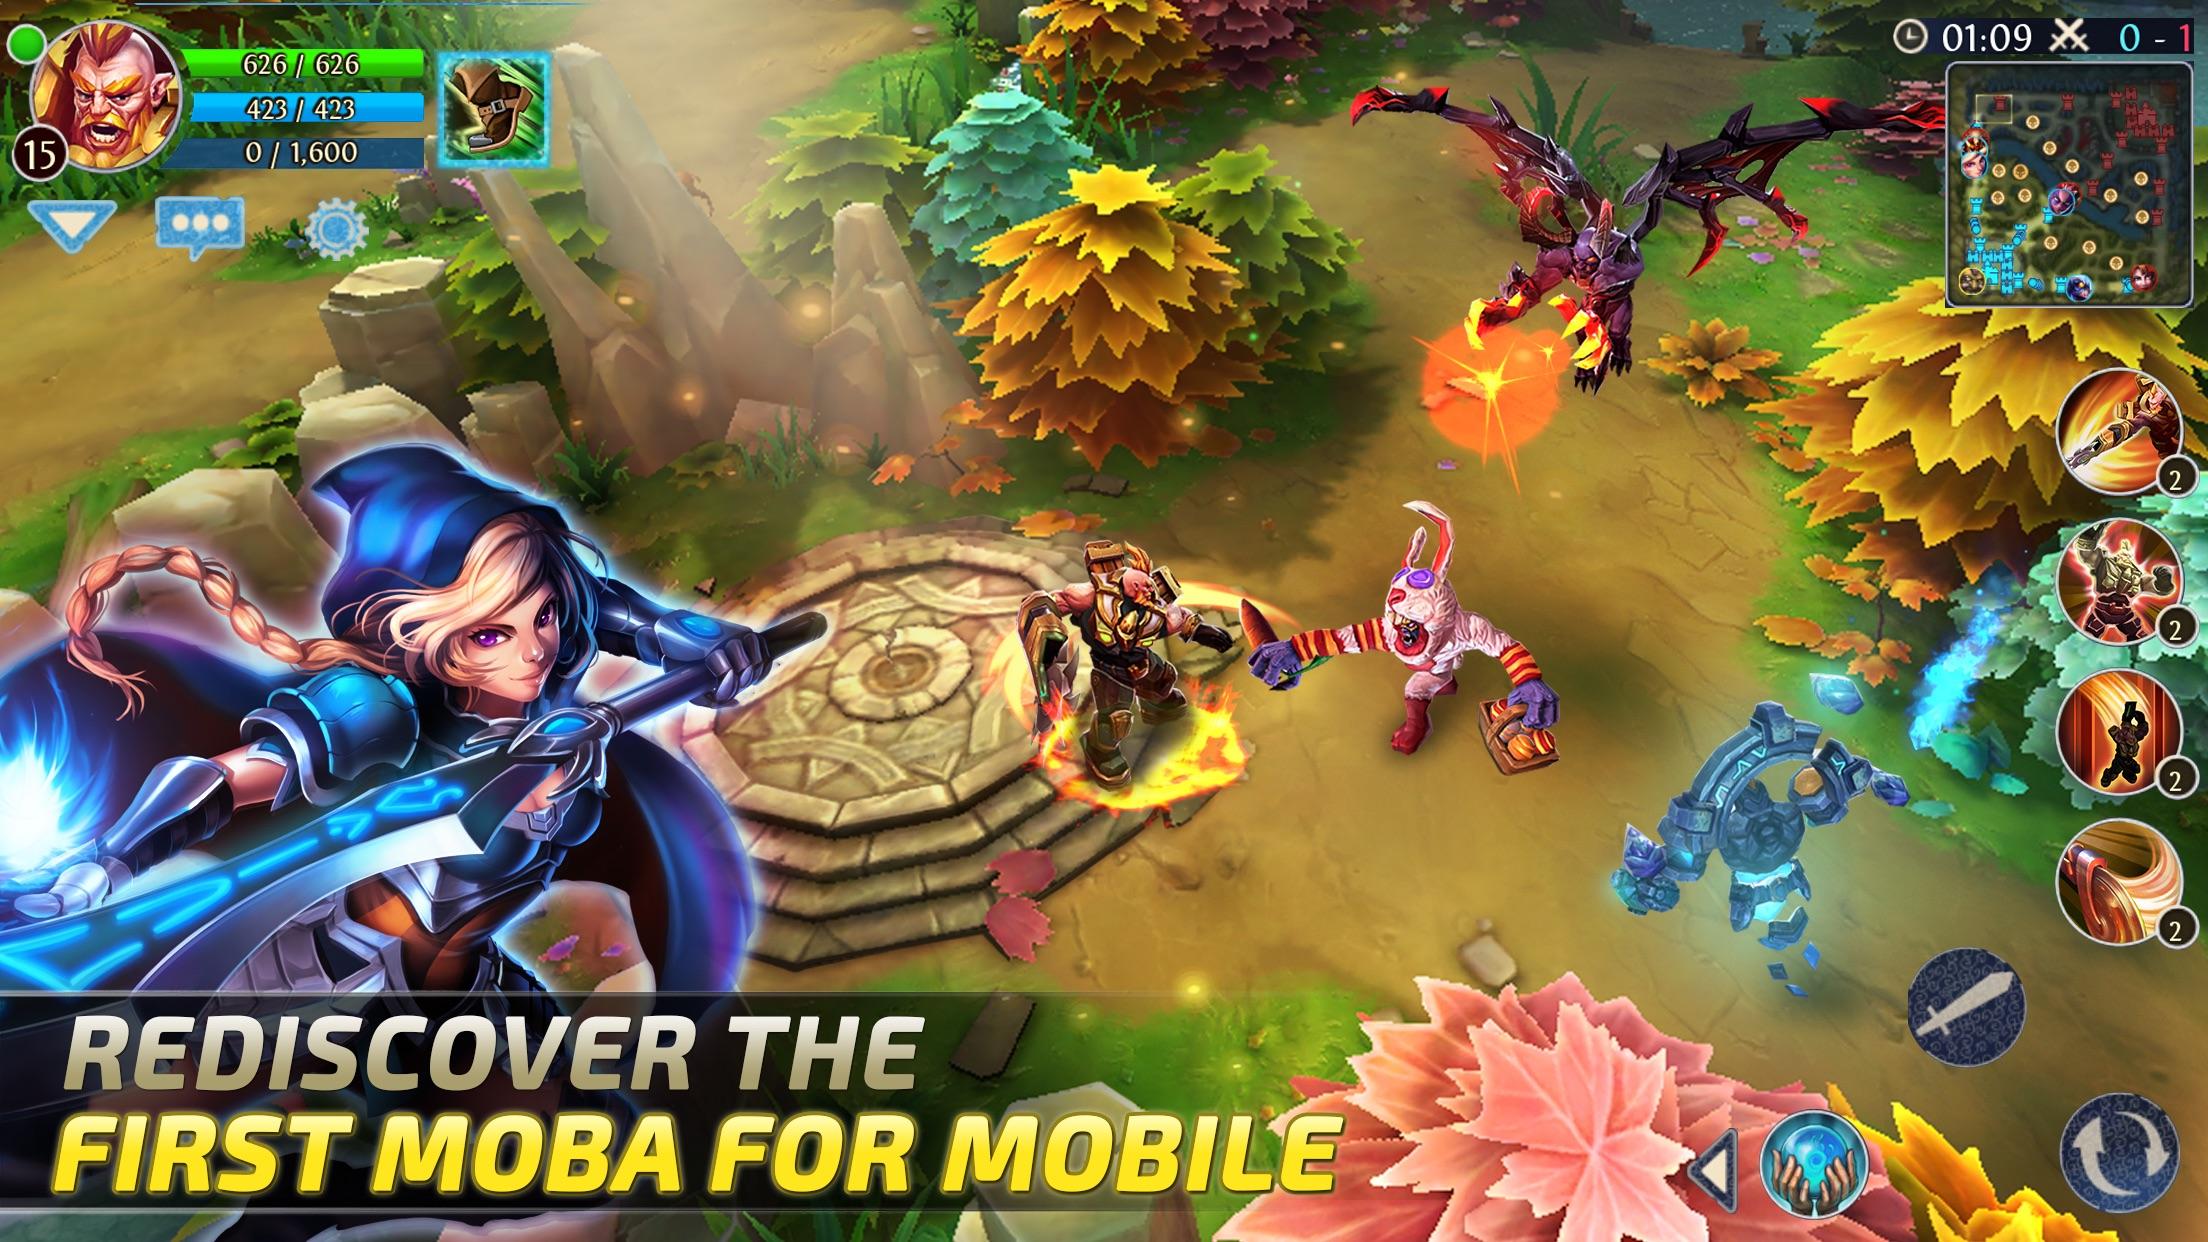 Heroes of Order & Chaos - Multiplayer Online Game Screenshot